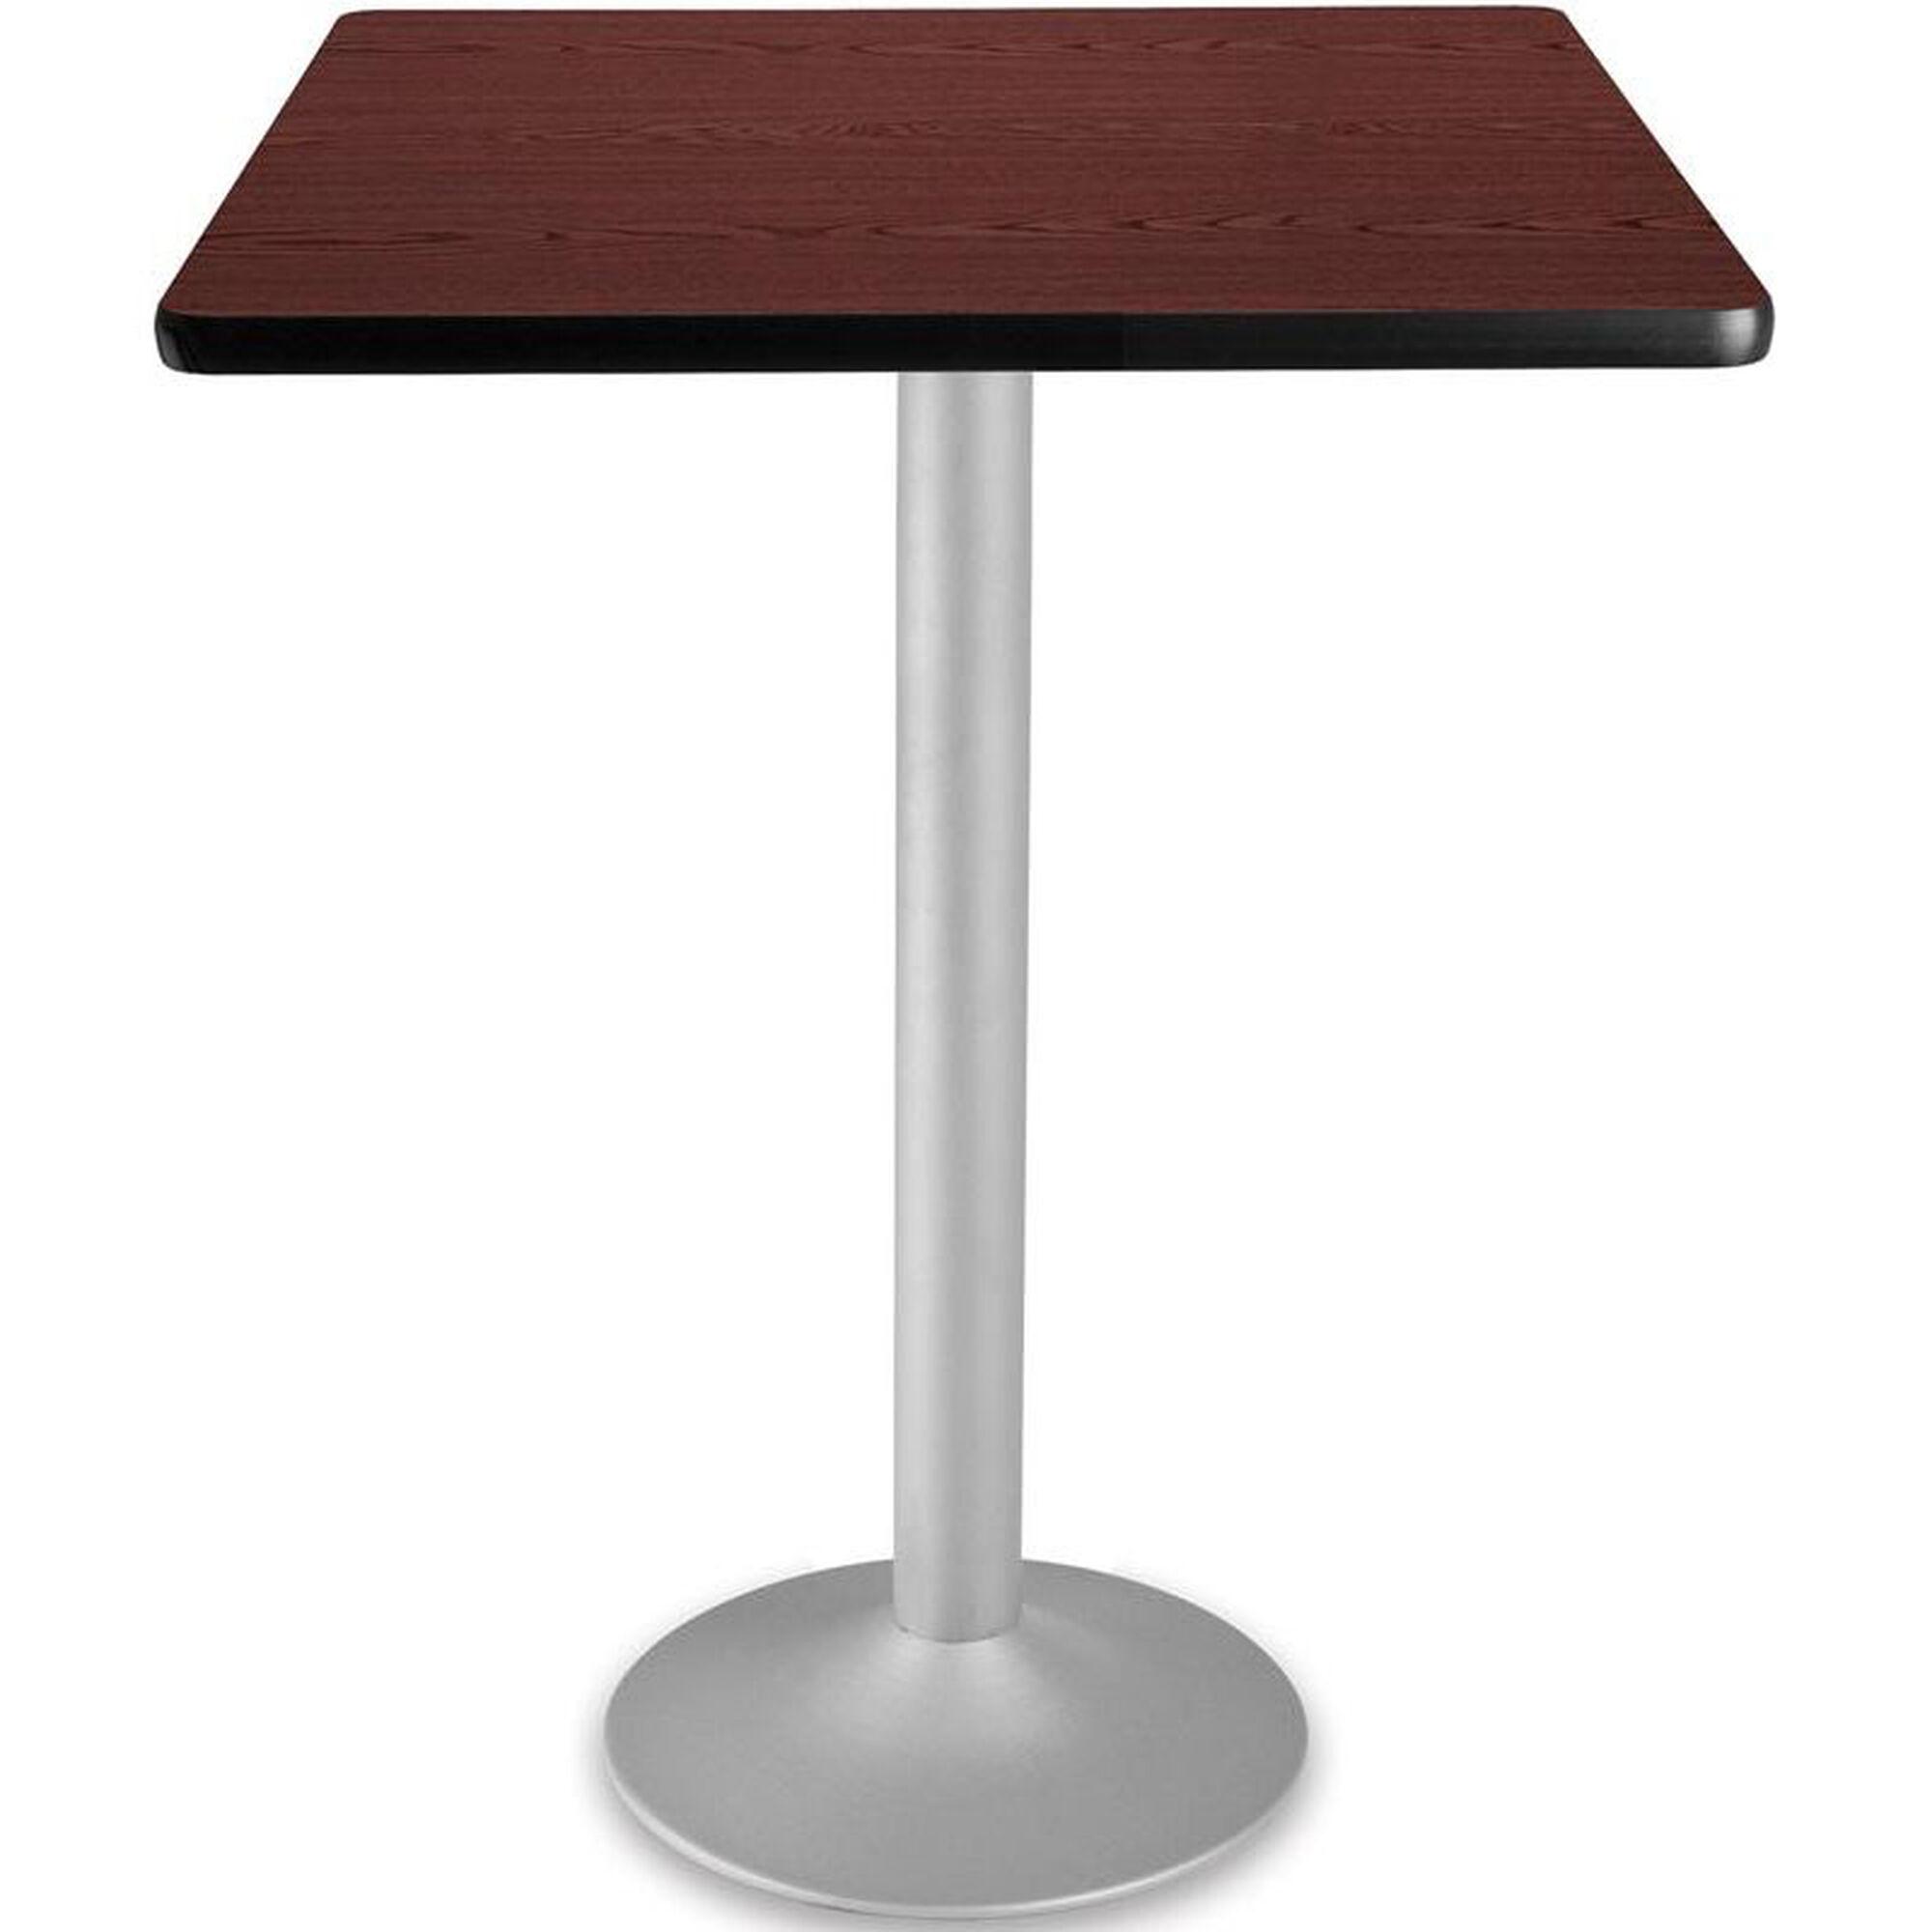 Ofm 30 39 39 Square Folding Cafe Table Mahogany Cft30sq Mhgy